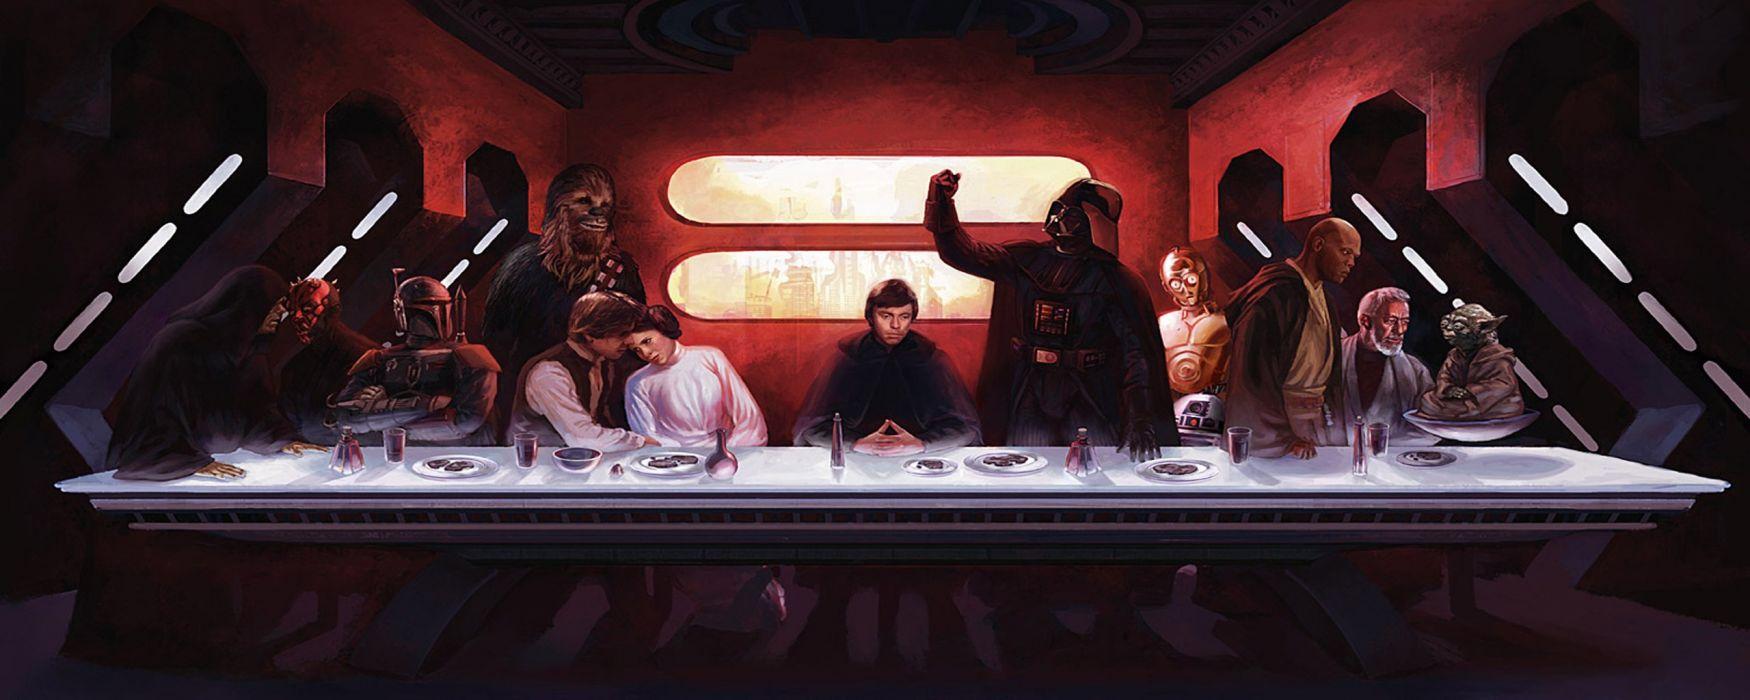 Star Wars The Last Supper wallpaper